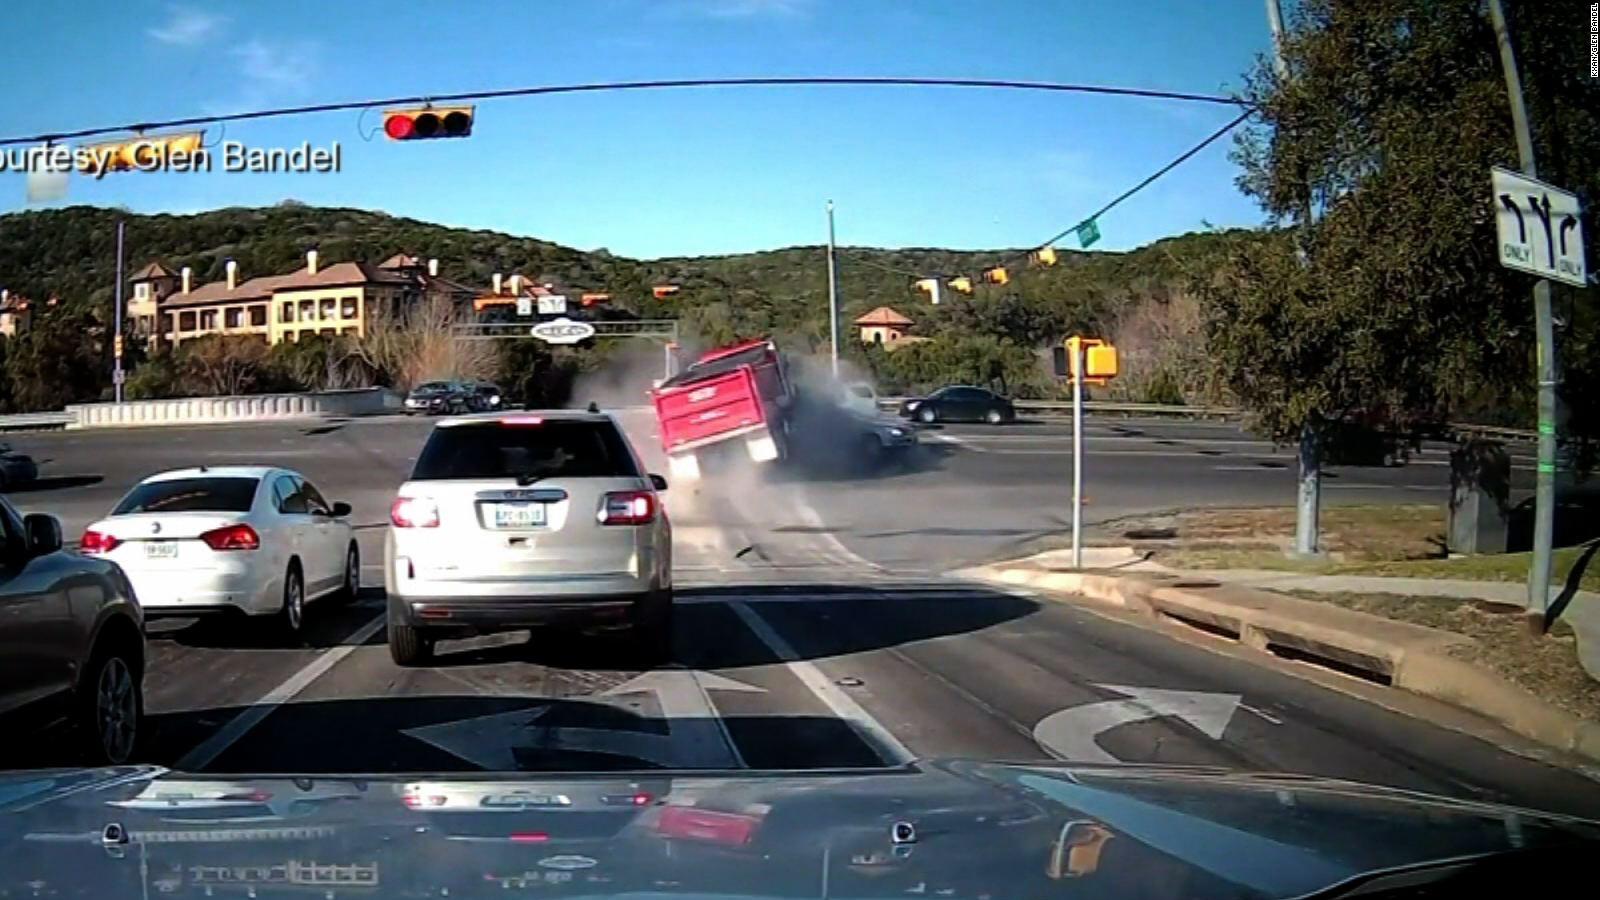 Terrifying dump truck crash caught on camera - CNN Video